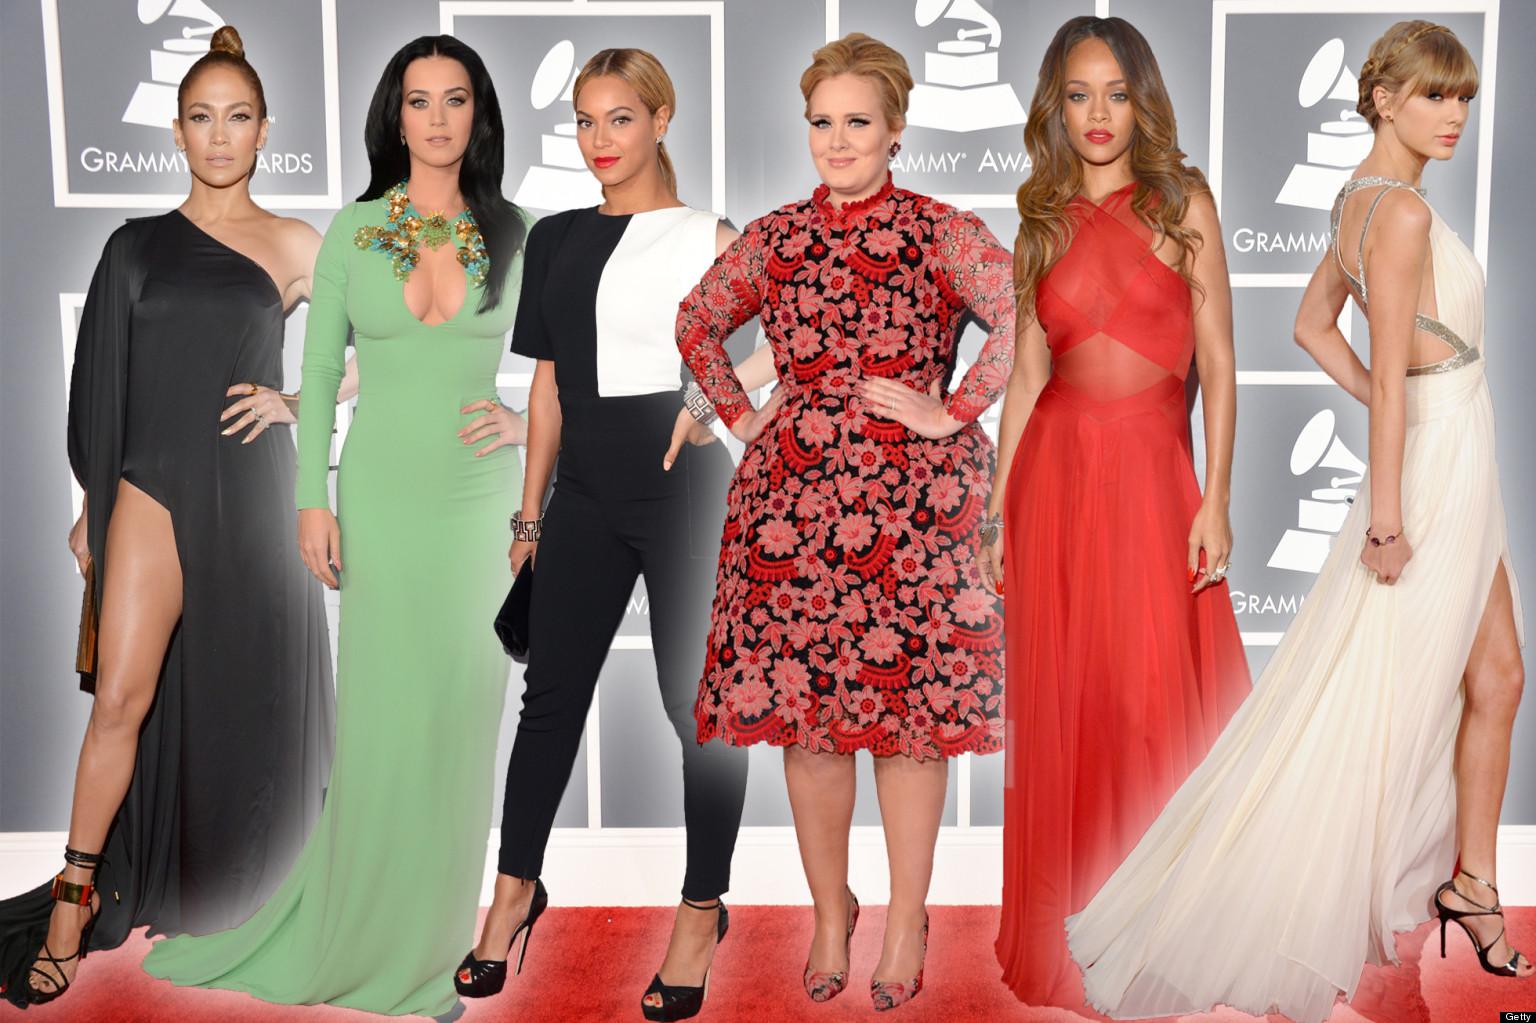 Grammys: Grammys 2013: Red Carpet (PICTURES)